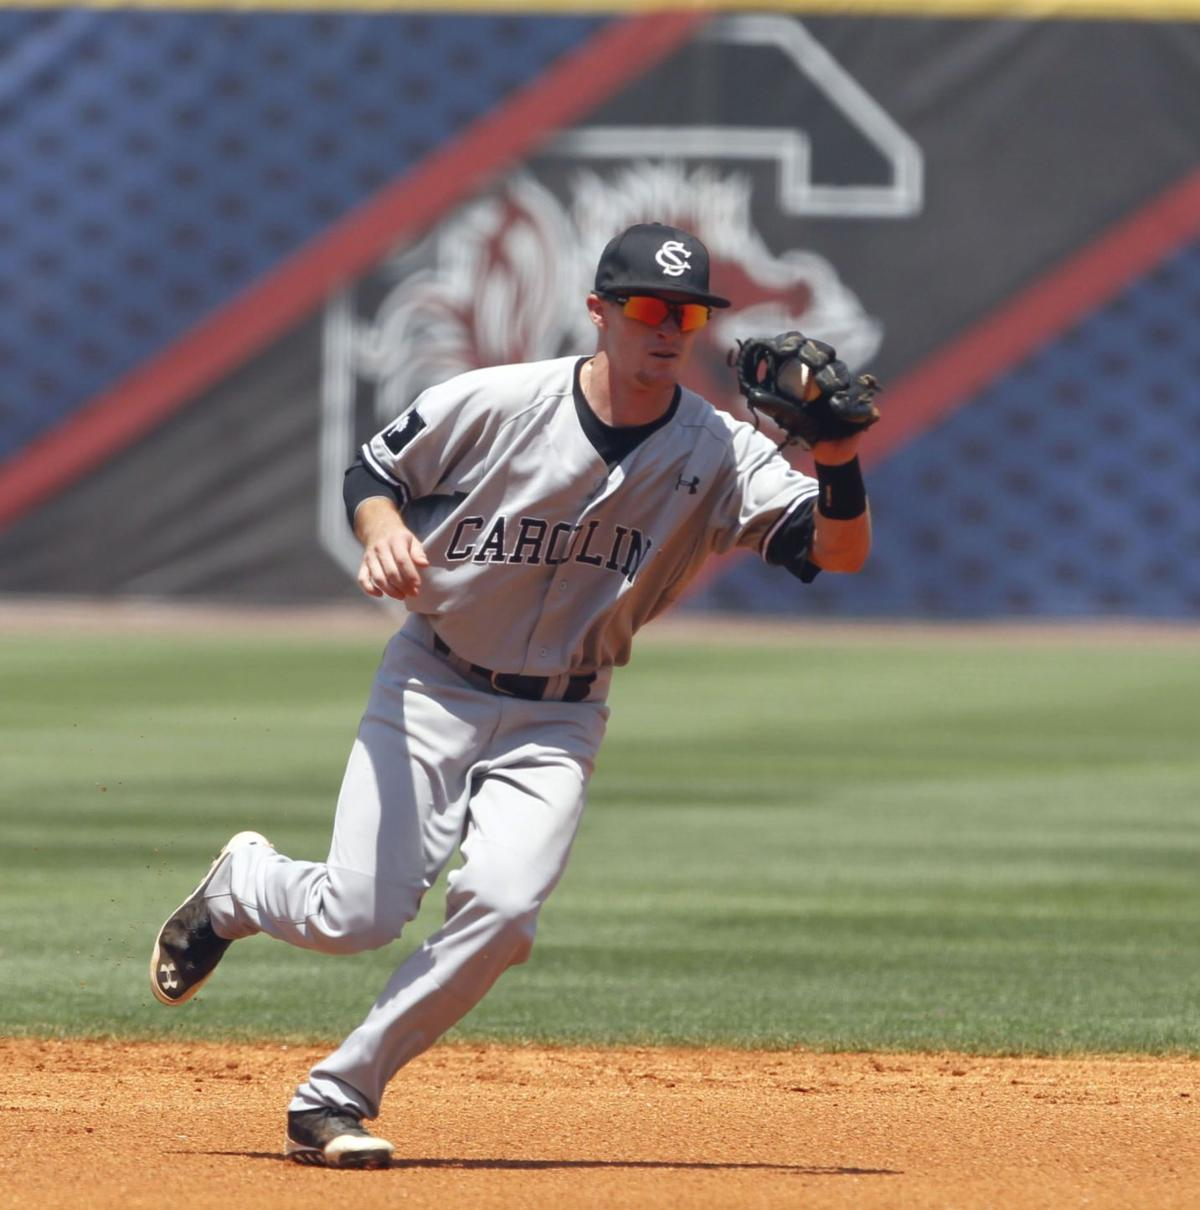 South Carolina heavy favorites playing at home